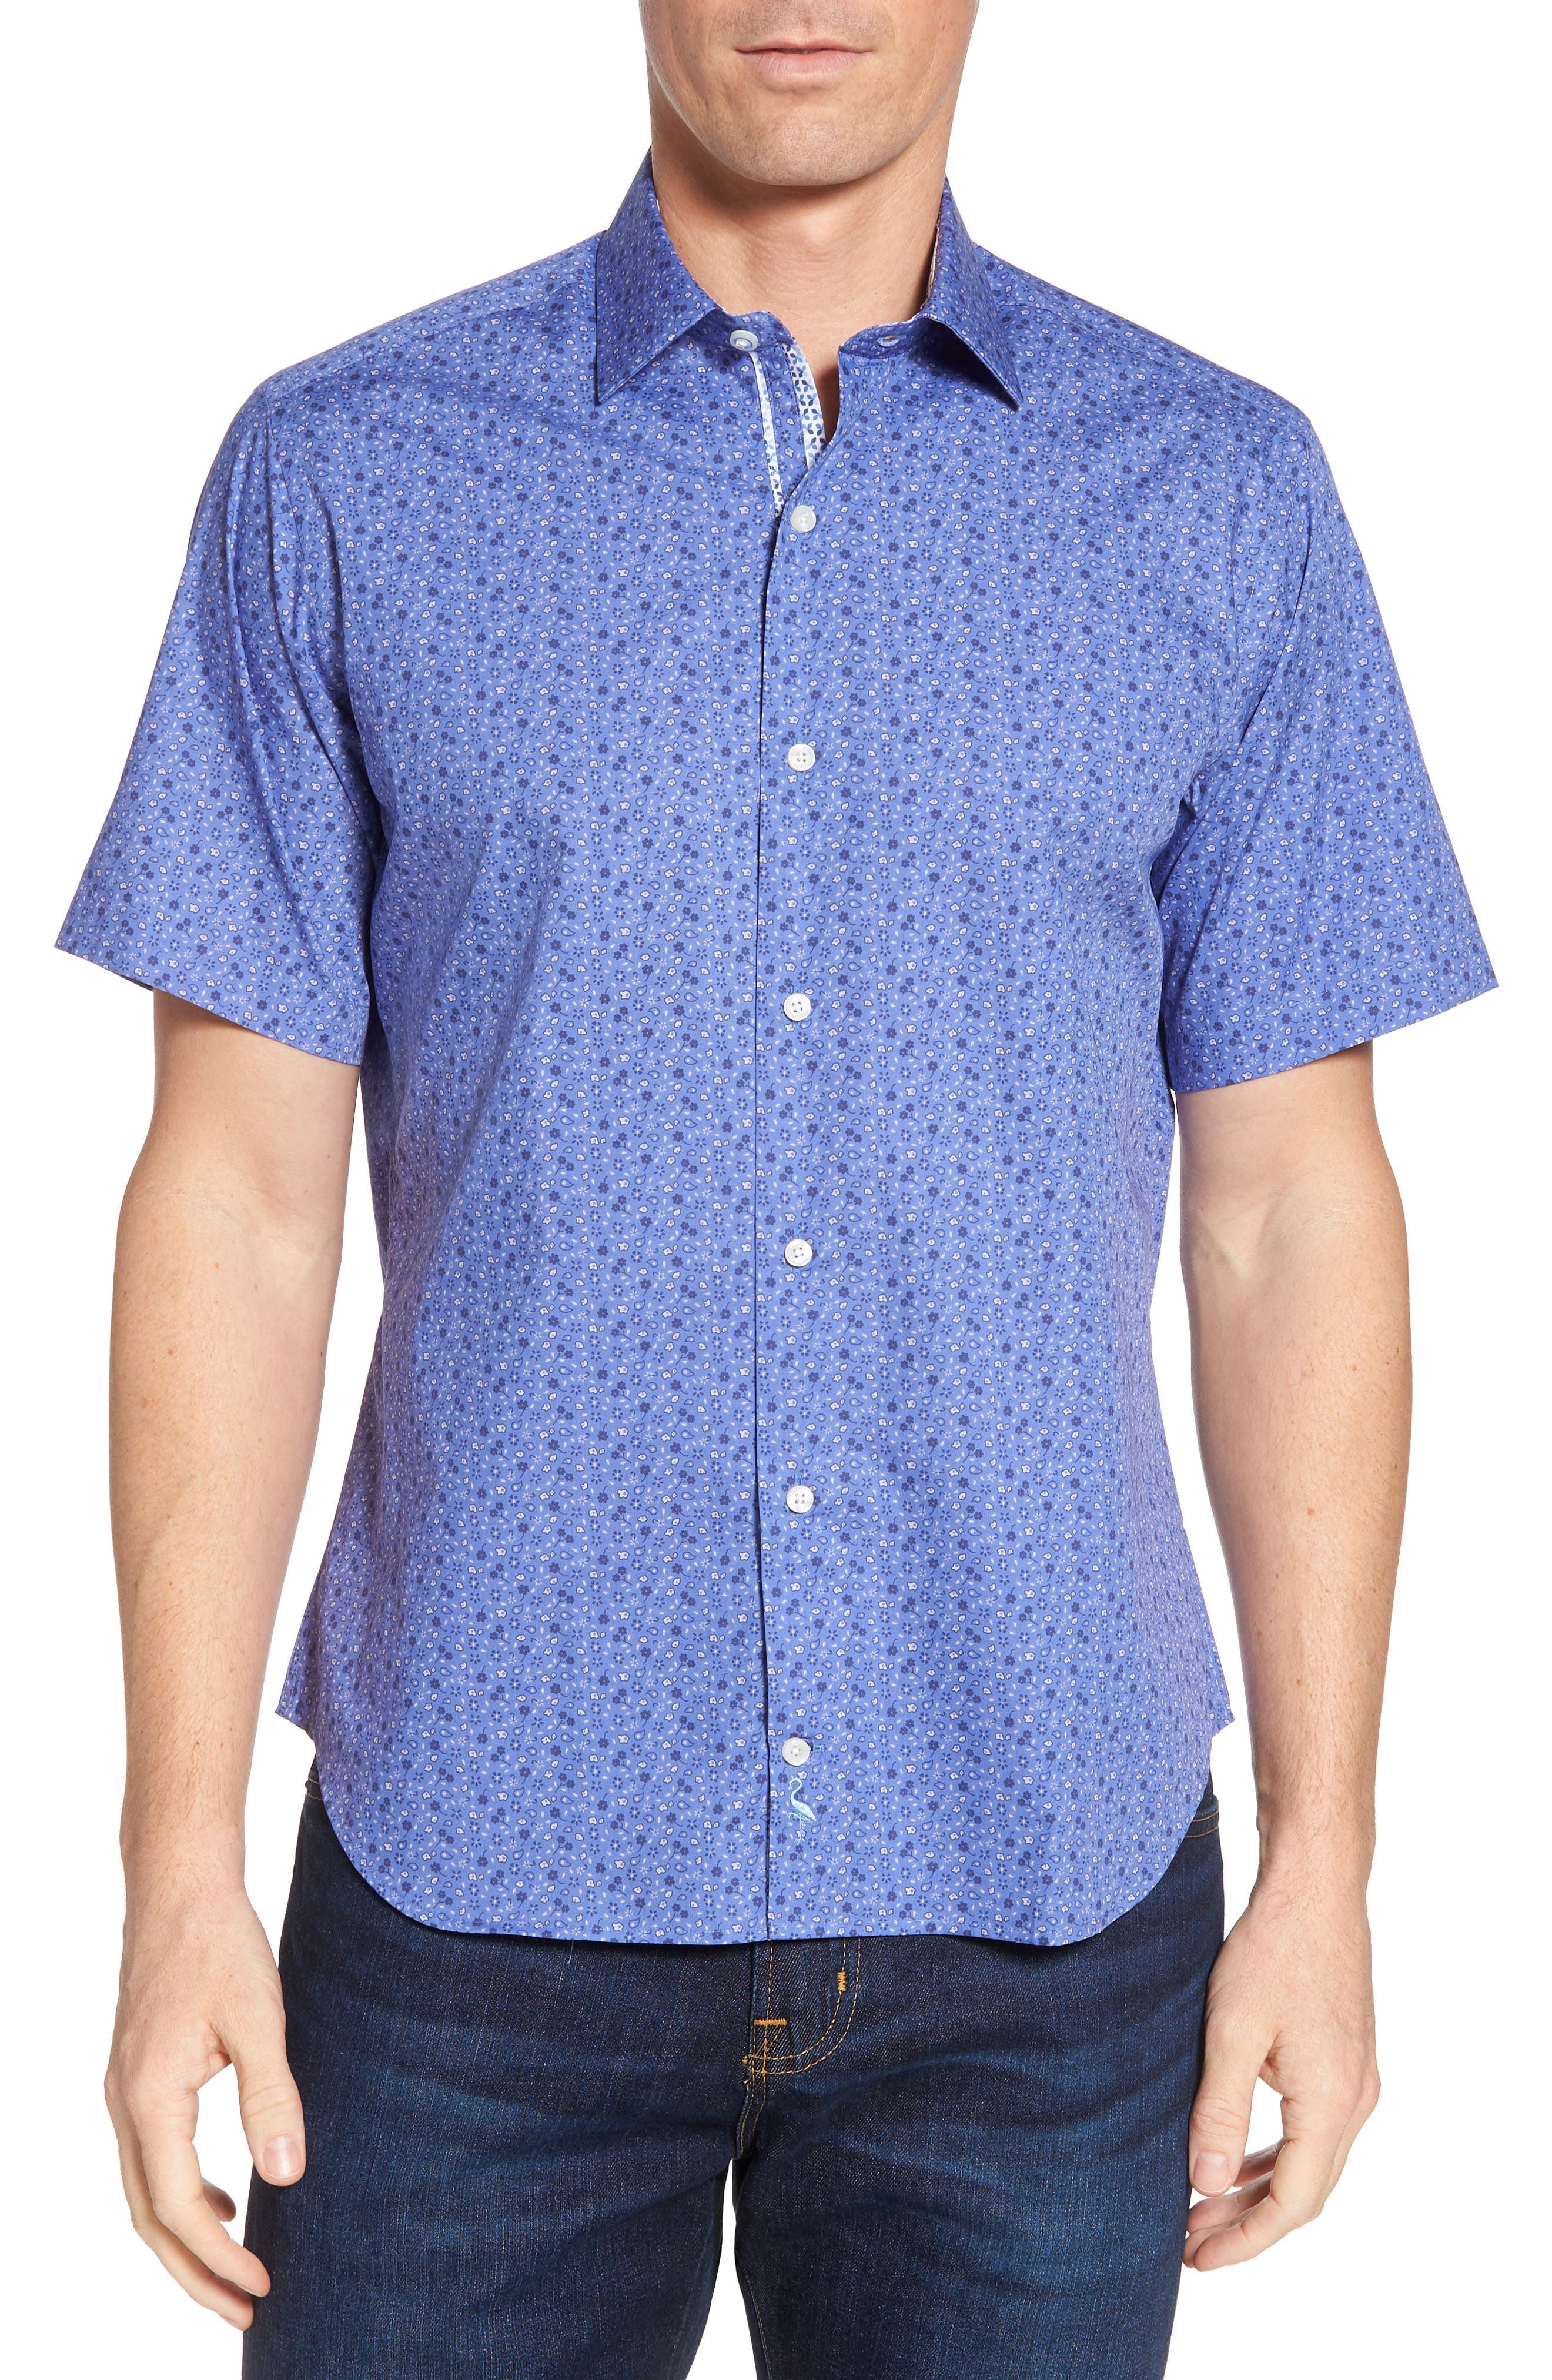 Ballou Regular Fit Floral Print Sport Shirt,                         Main,                         color, 430